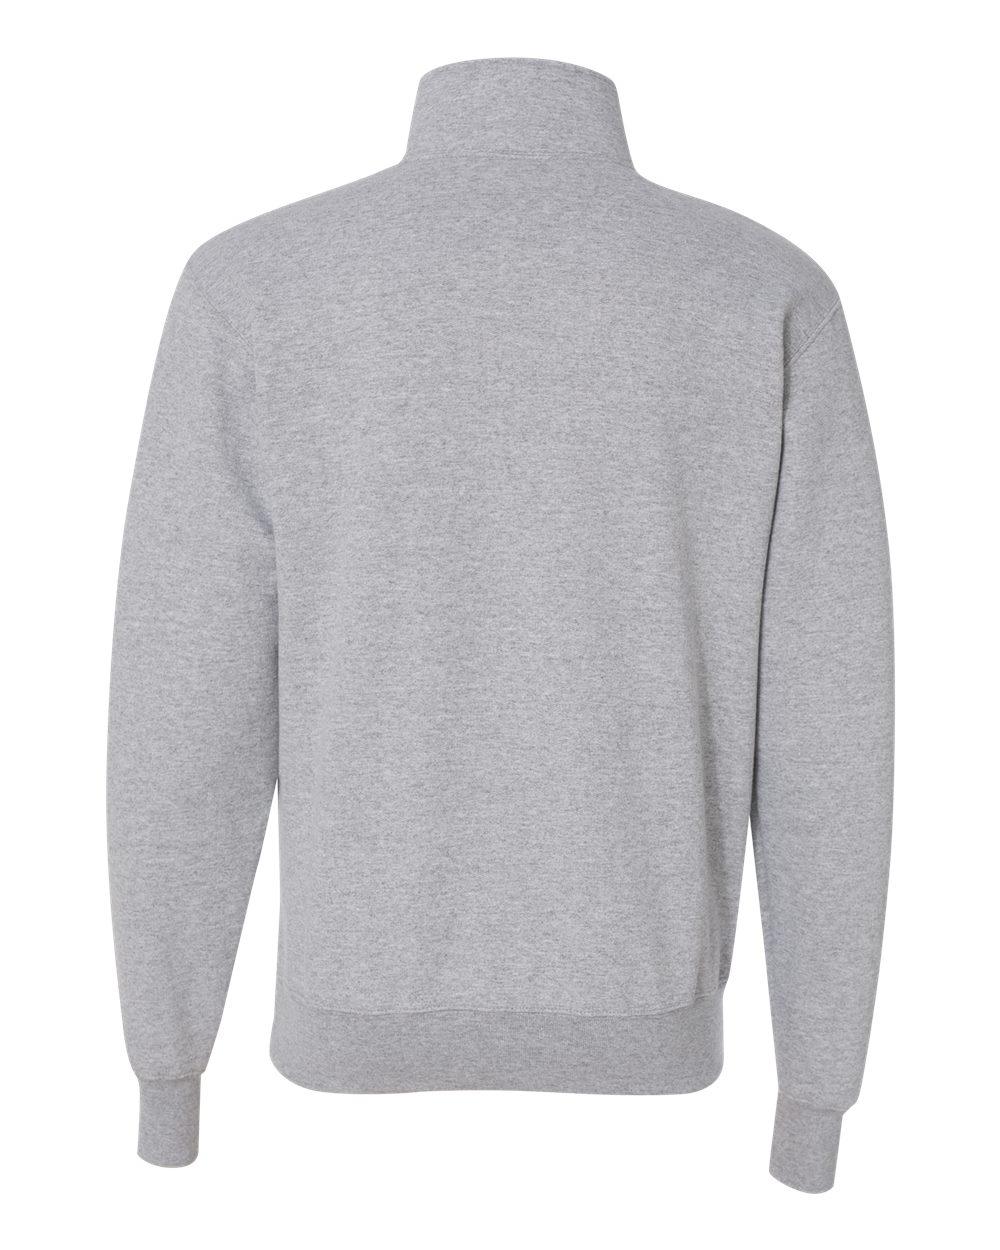 Champion-Mens-Double-Dry-Eco-Quarter-Zip-Pullover-Sweatshirt-S400-up-to-3XL miniature 10